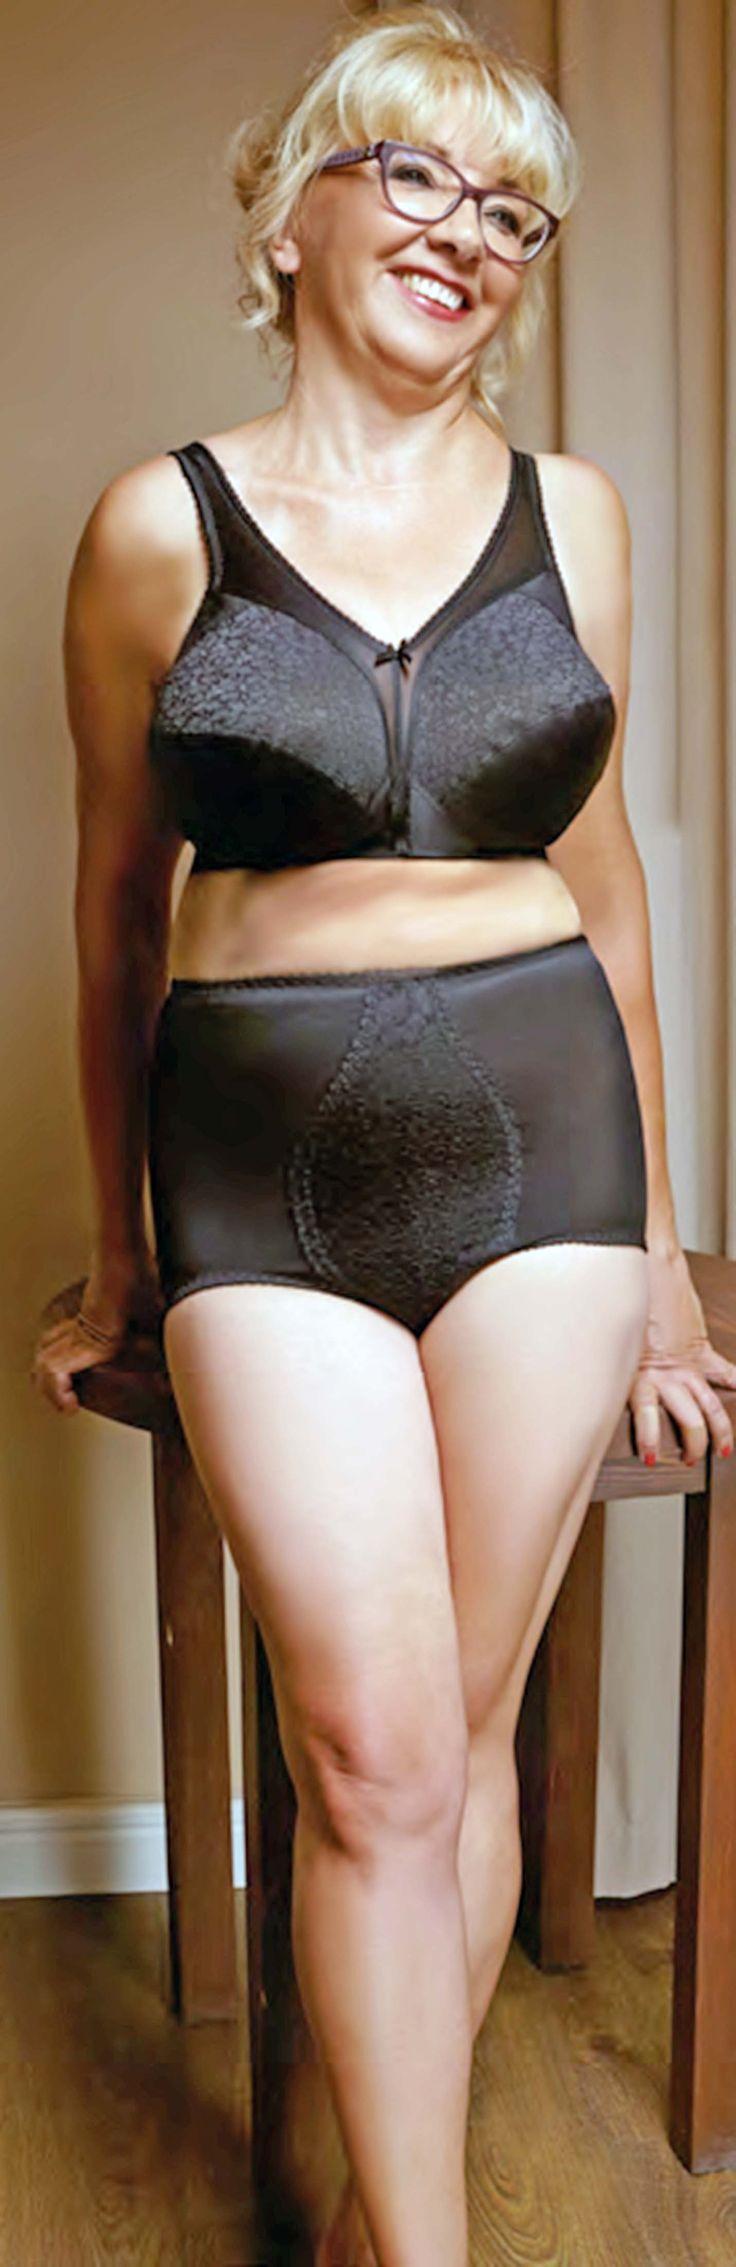 my want sex wearing girdle i